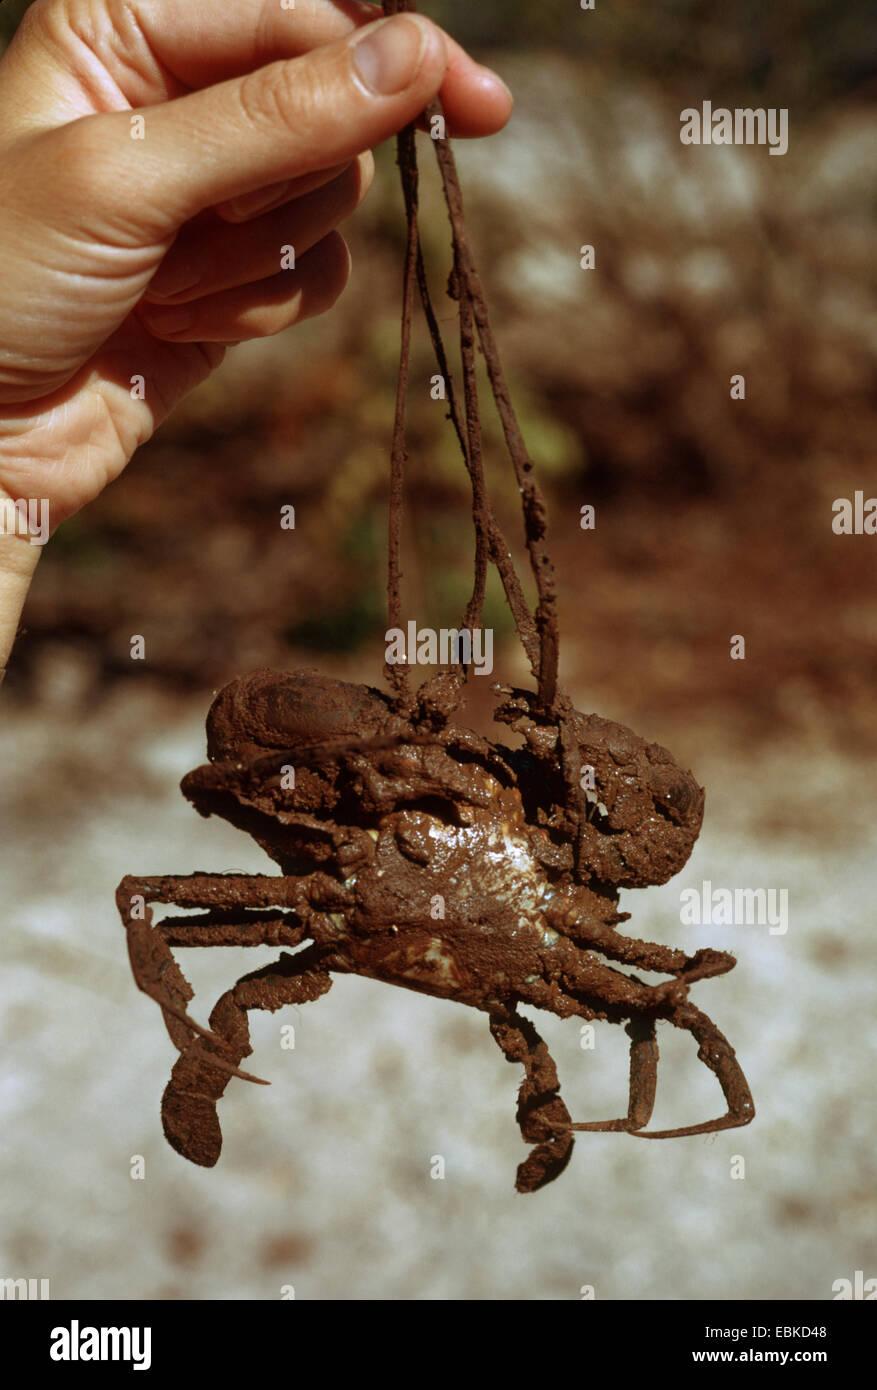 Piscine de boue dentelée, crabe de mangrove dentelée swimming crab, crabe de boue (Scylla serrata), crabe Photo Stock